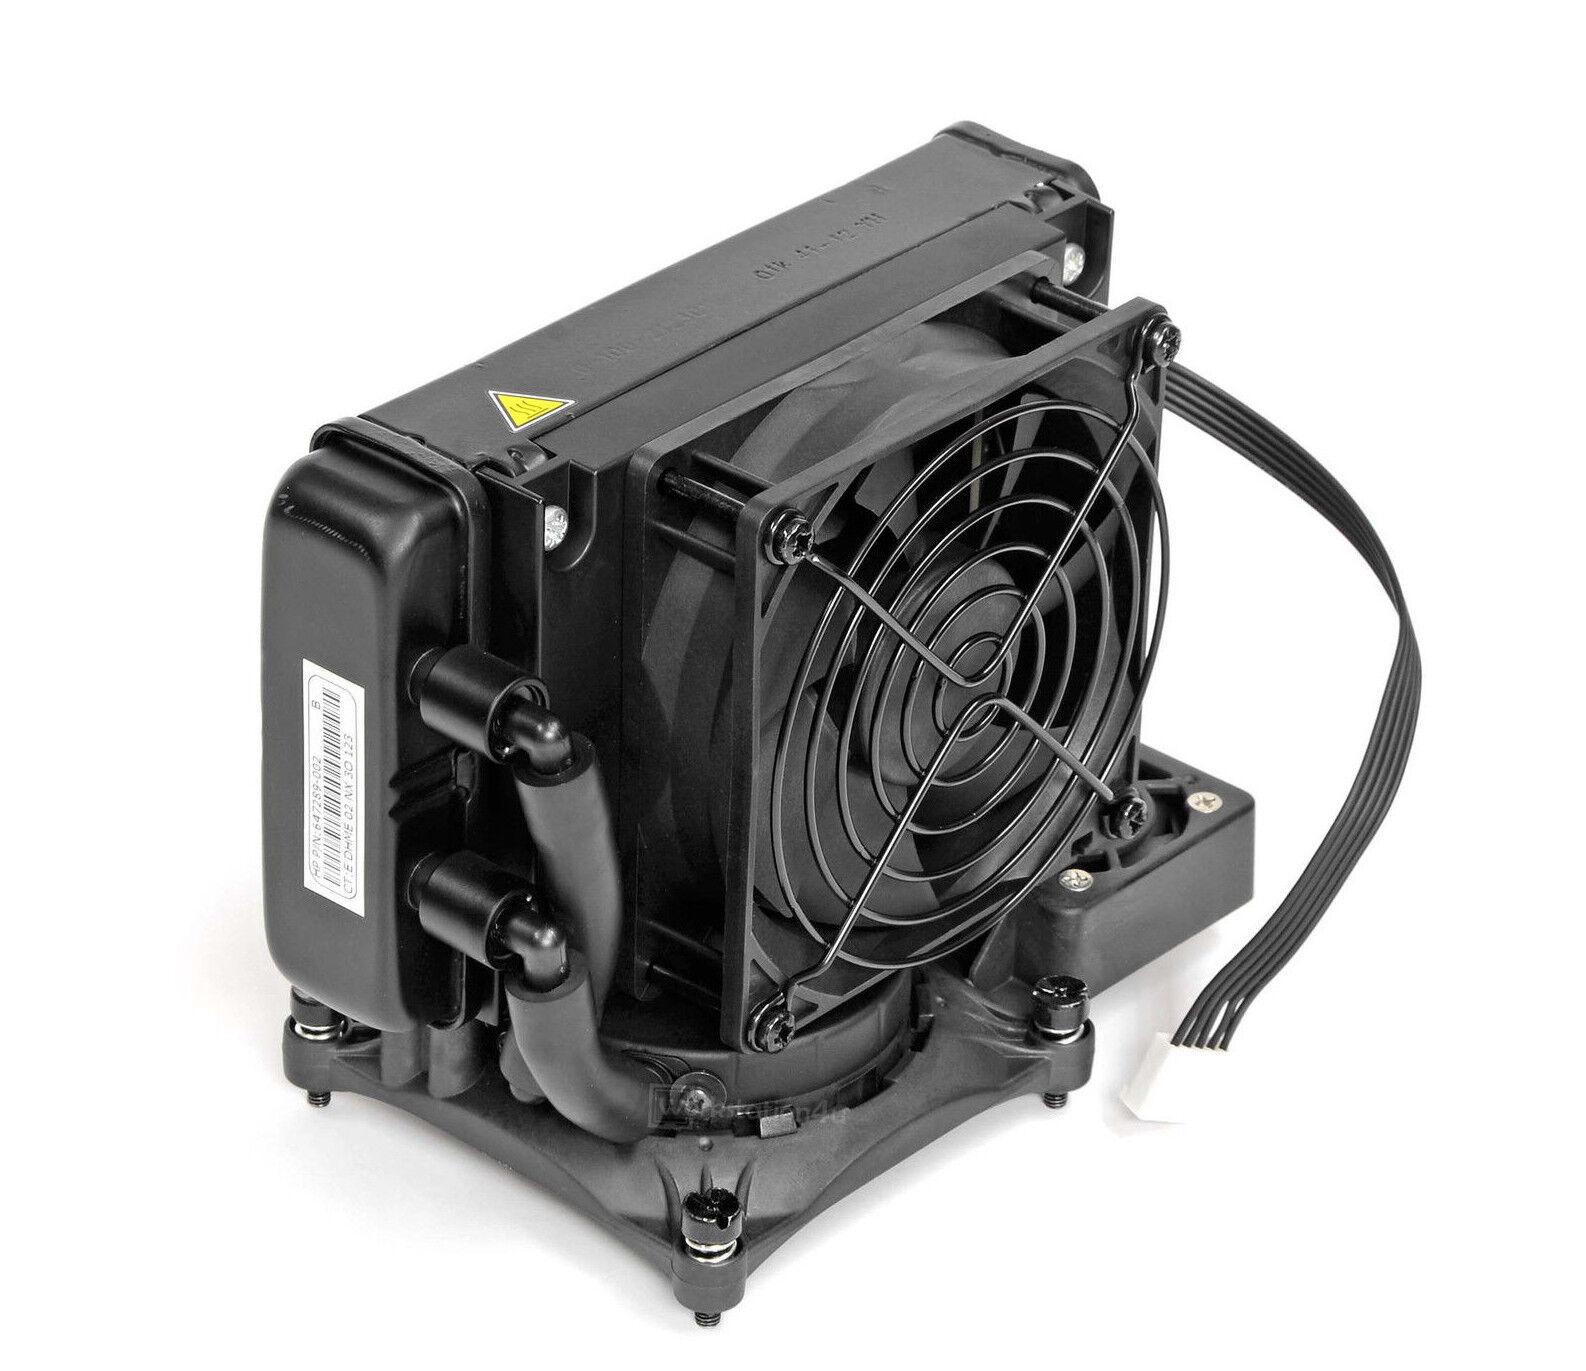 HP Z420 Liquid Cooling